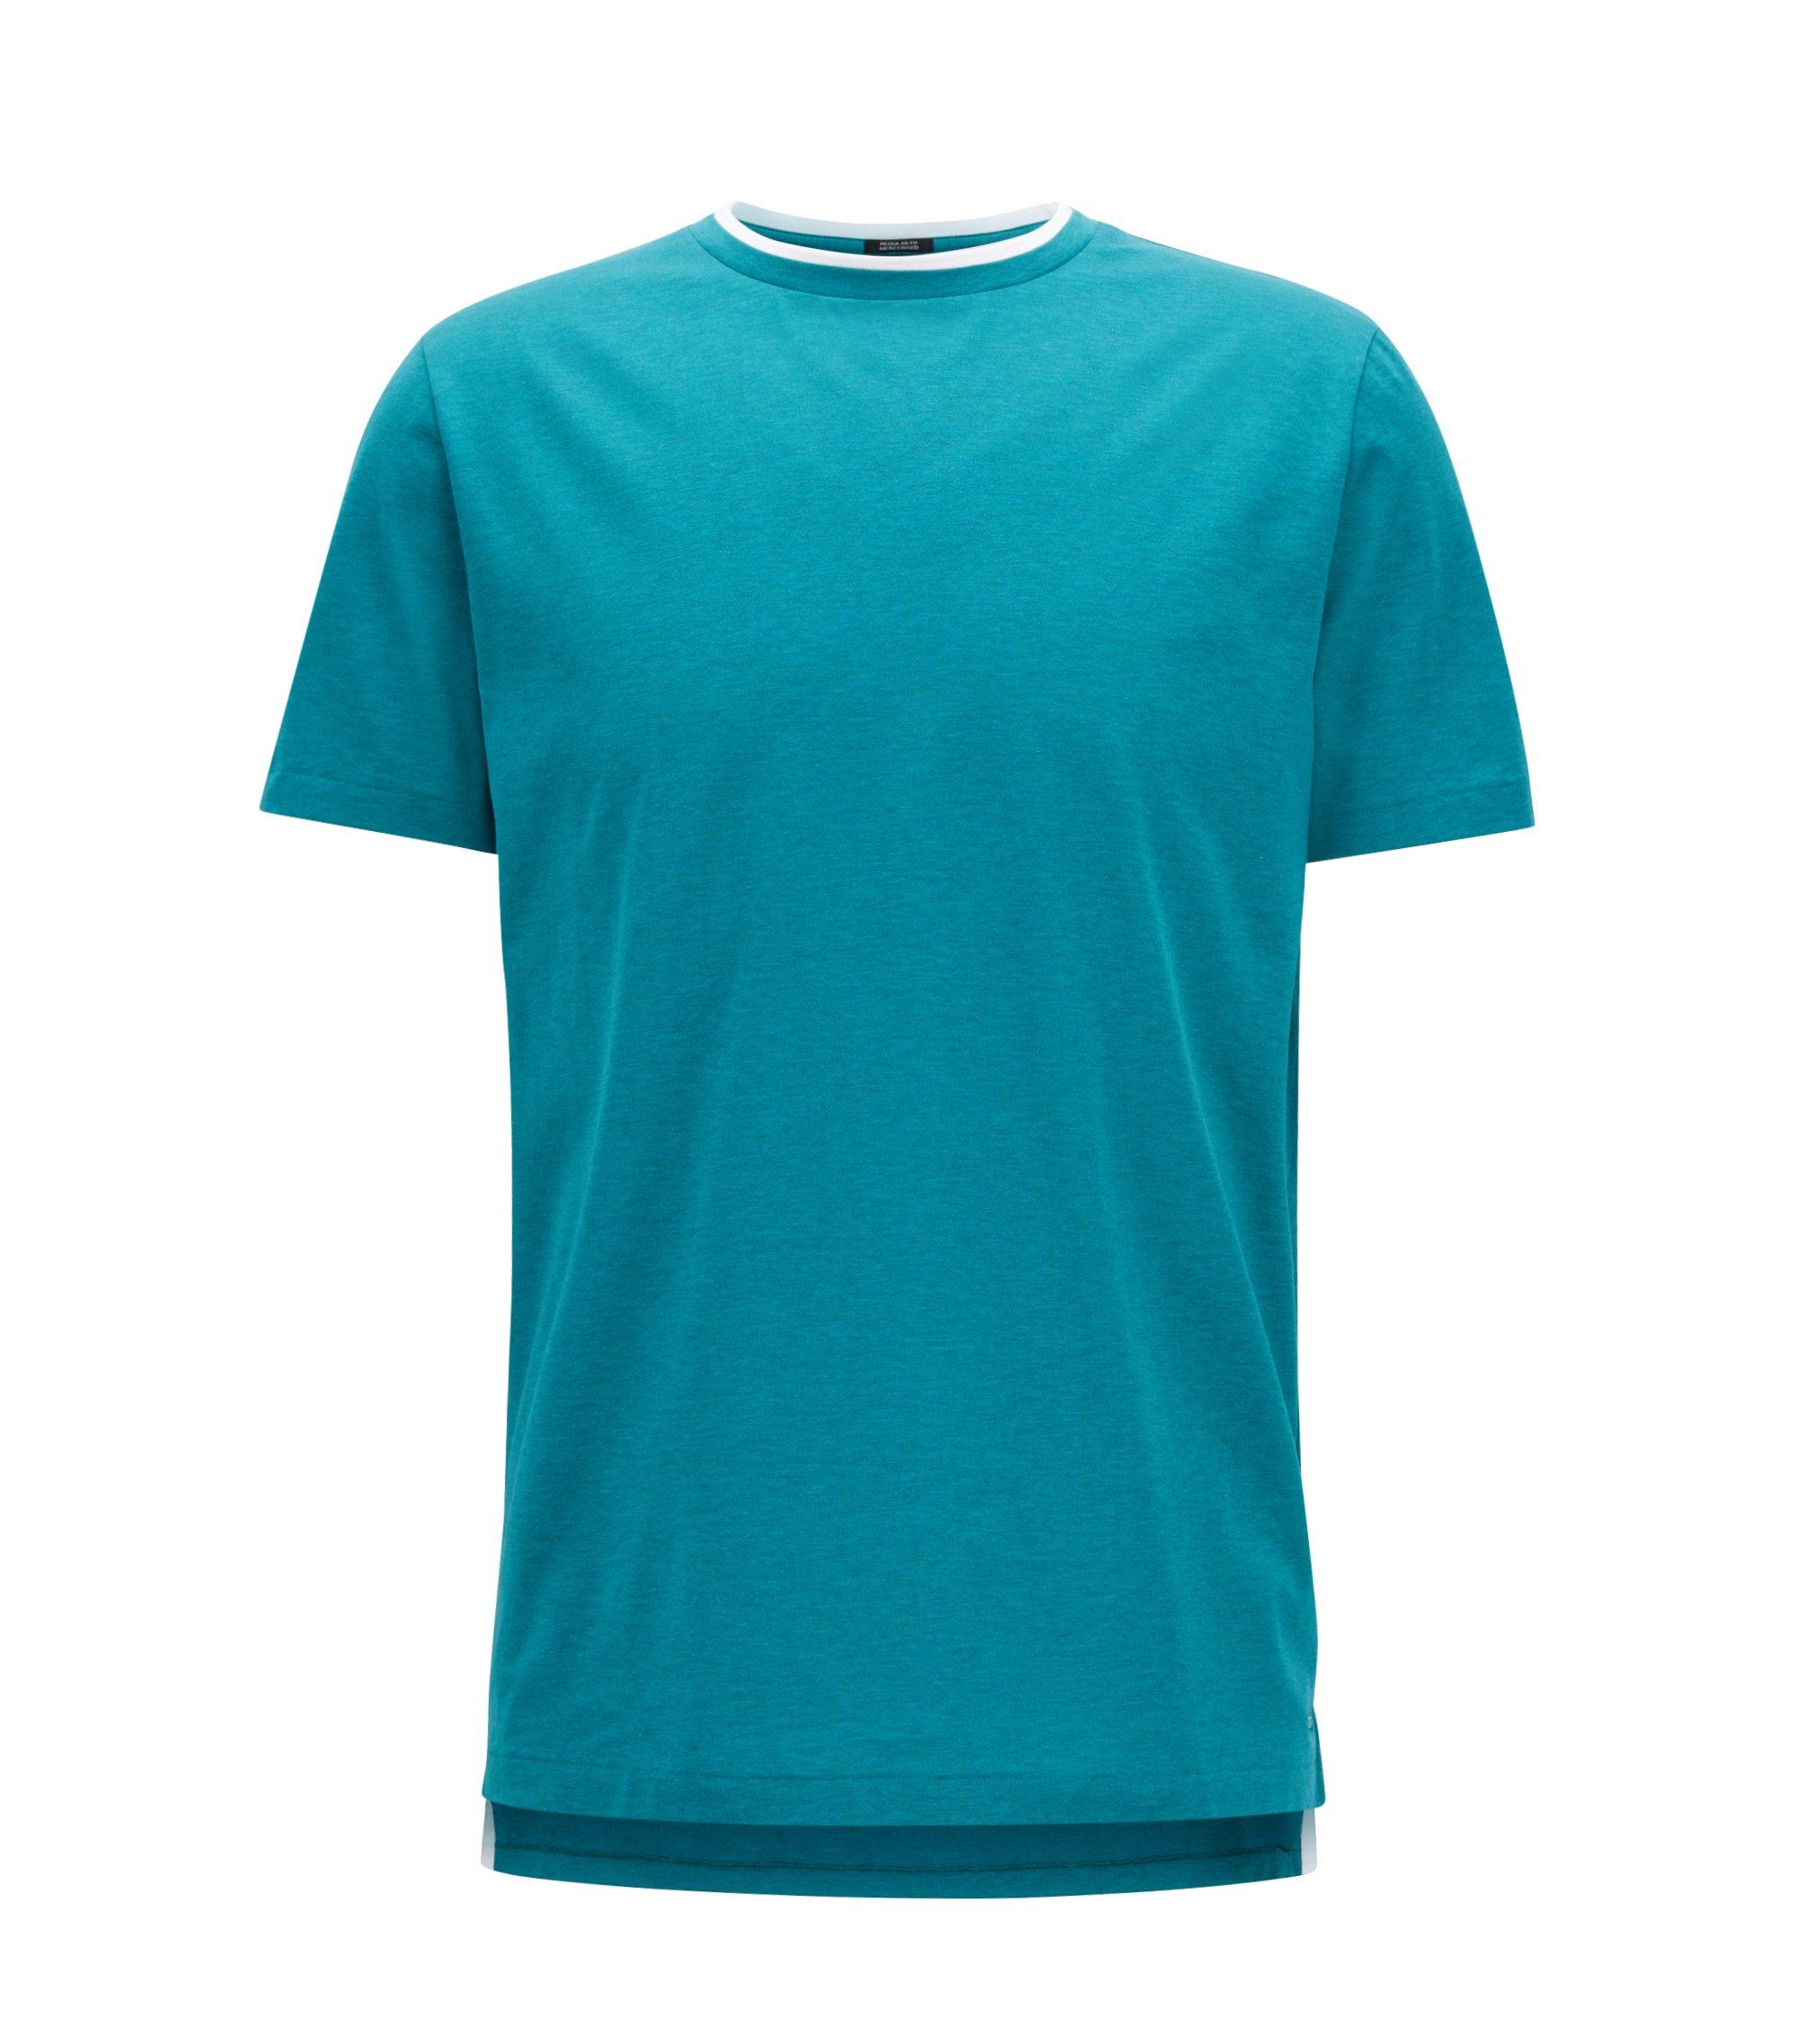 Double-collar T-shirt in mercerised single-jersey cotton, Green